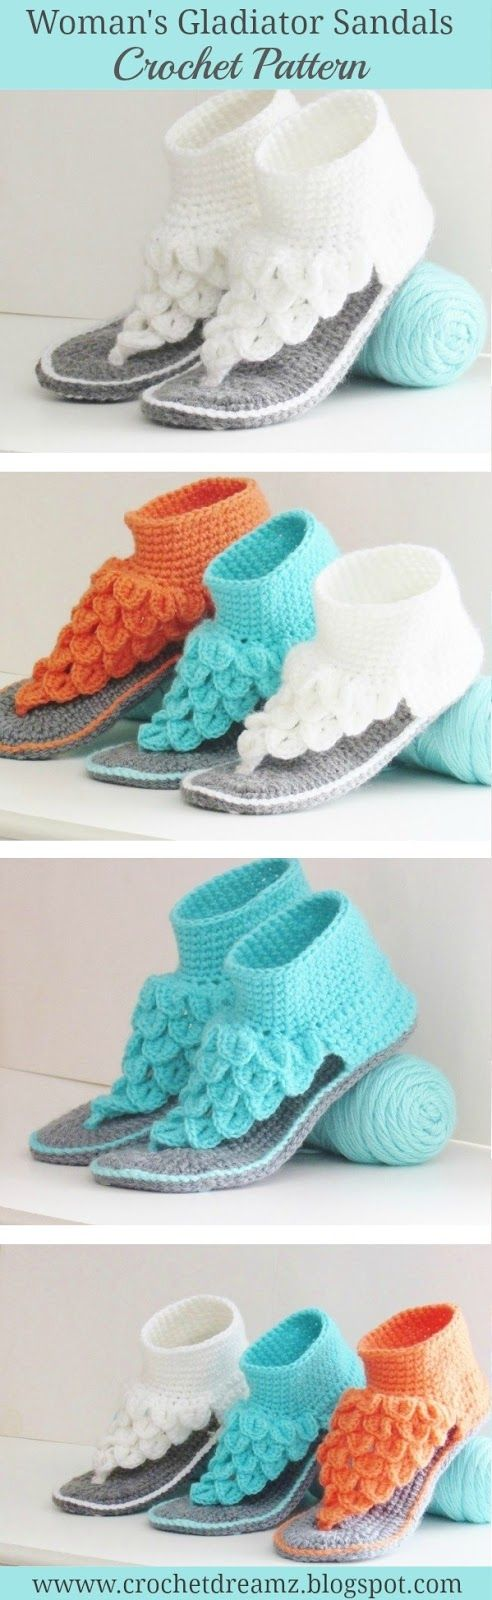 Crocodile Stitch Gladiator Sandals for Women, Crochet Pattern, Both ...